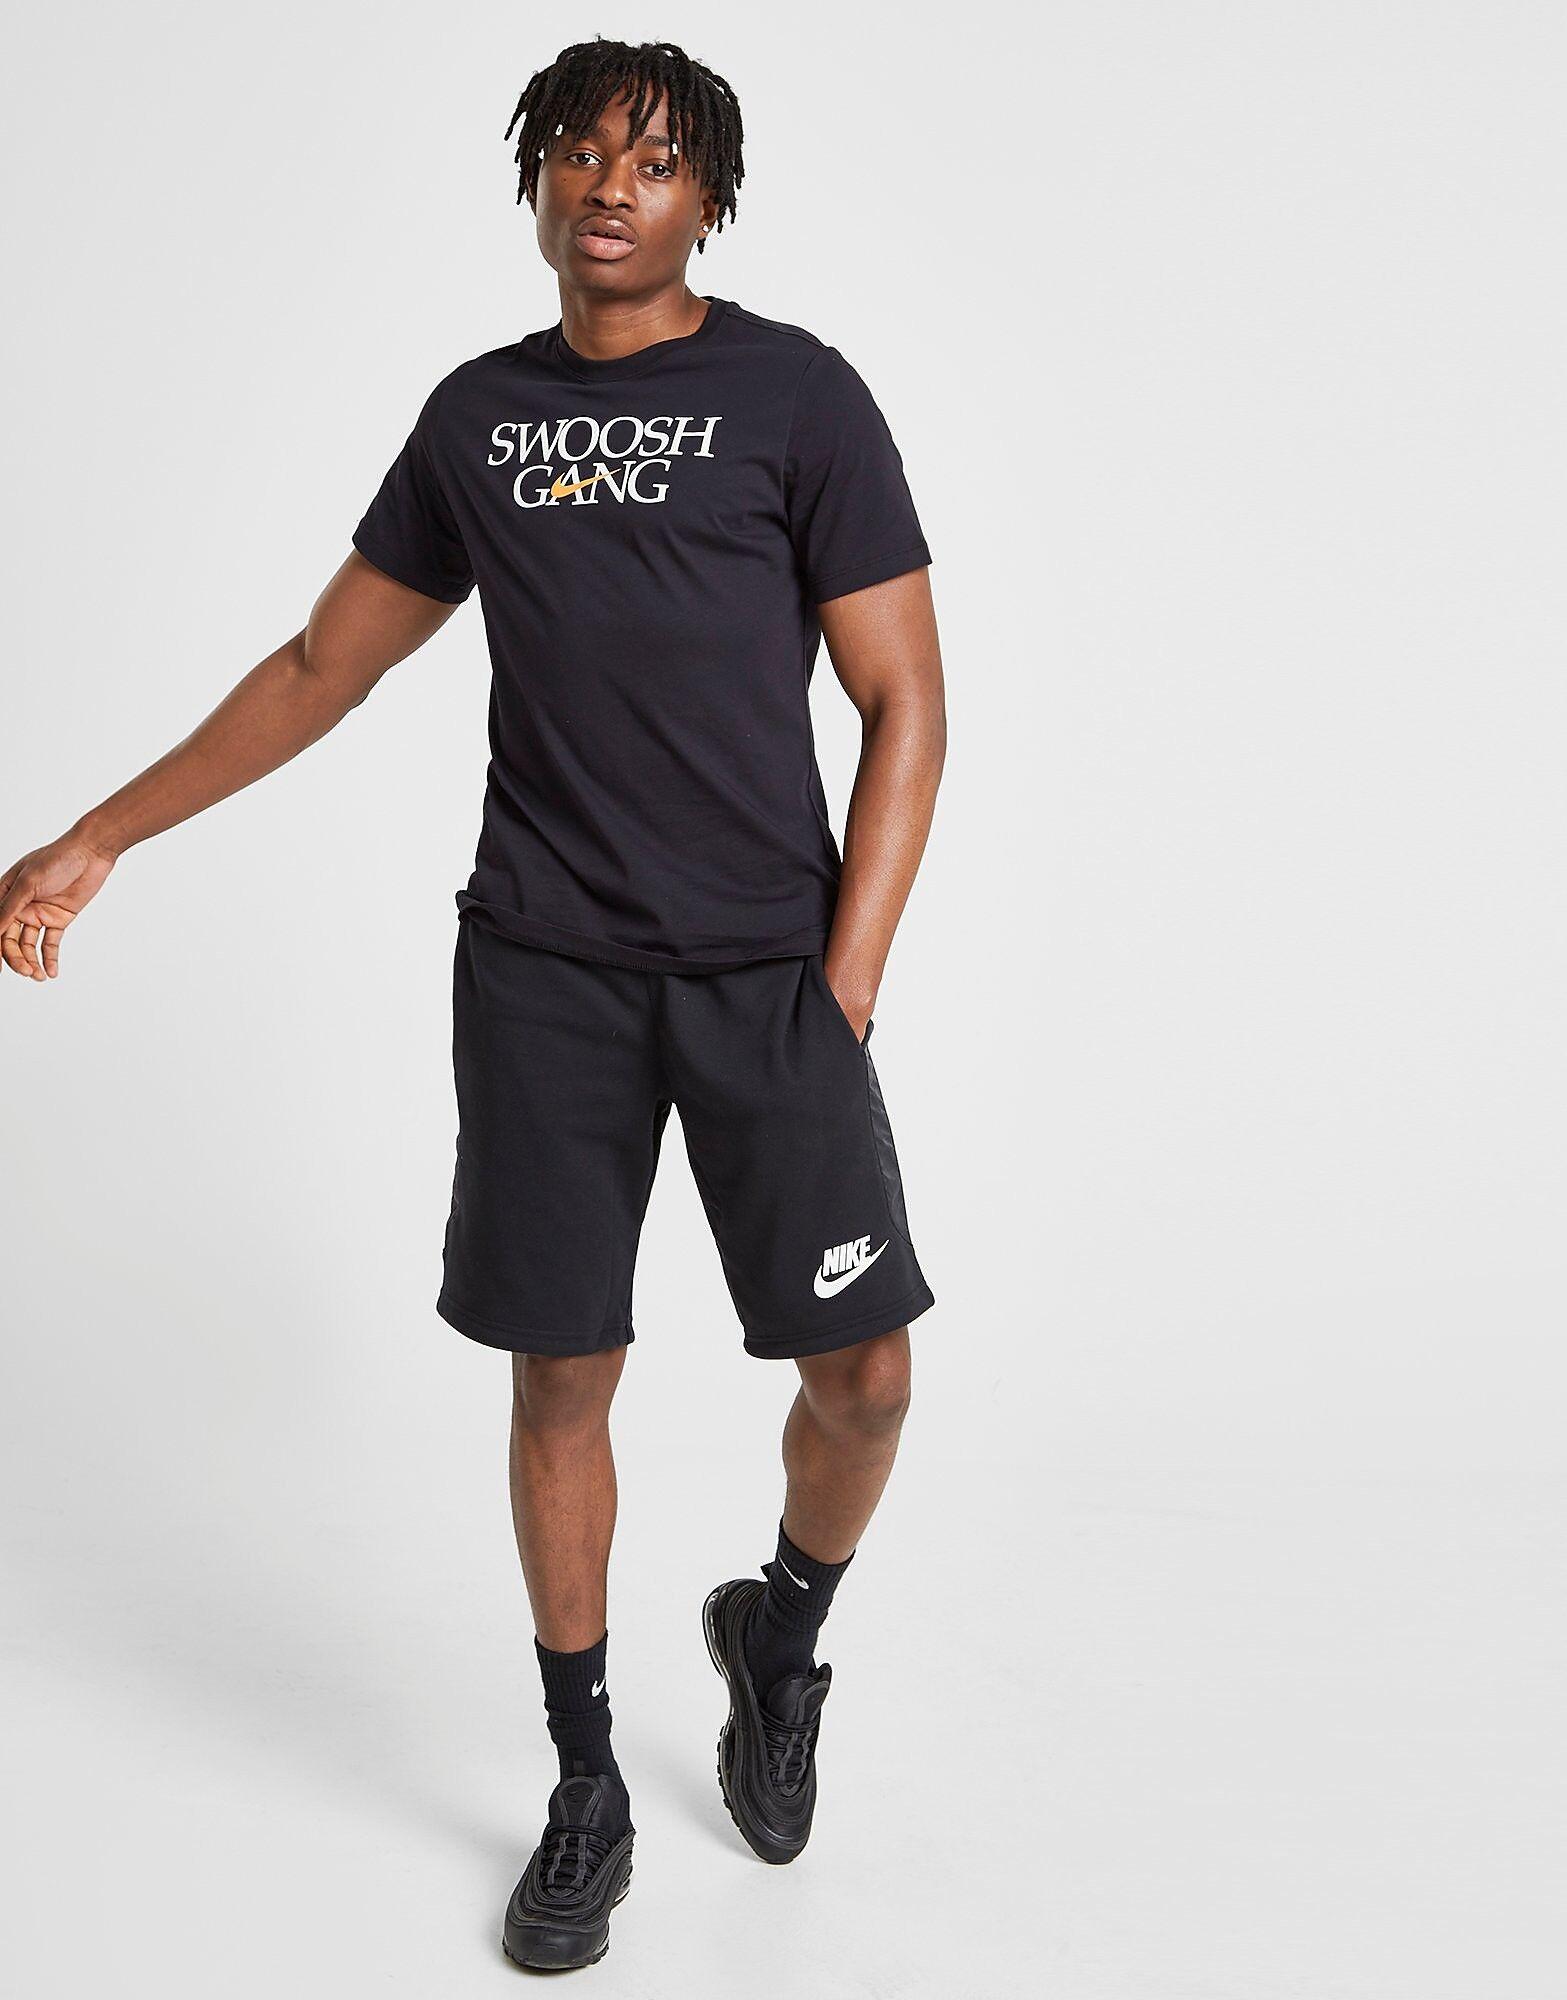 Image of Nike Hybrid Fleece Shortsit Miehet - Only at JD - Mens, Musta